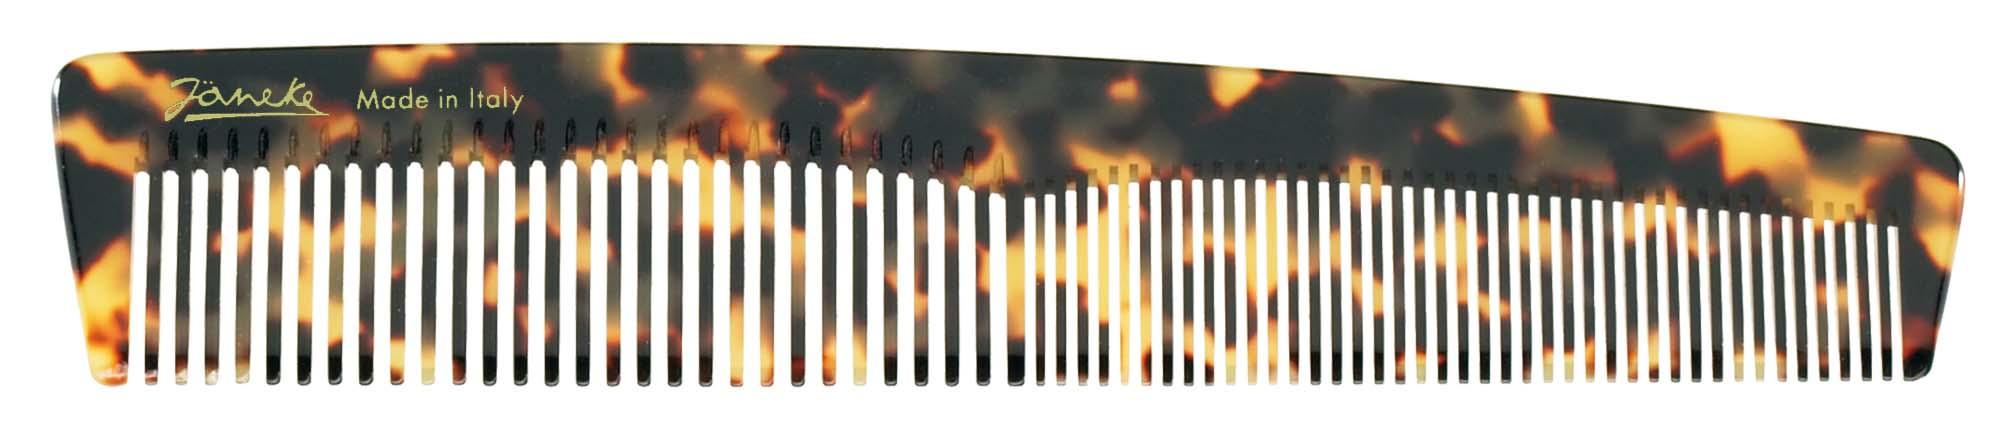 Spotted toilette comb Cod. 27666